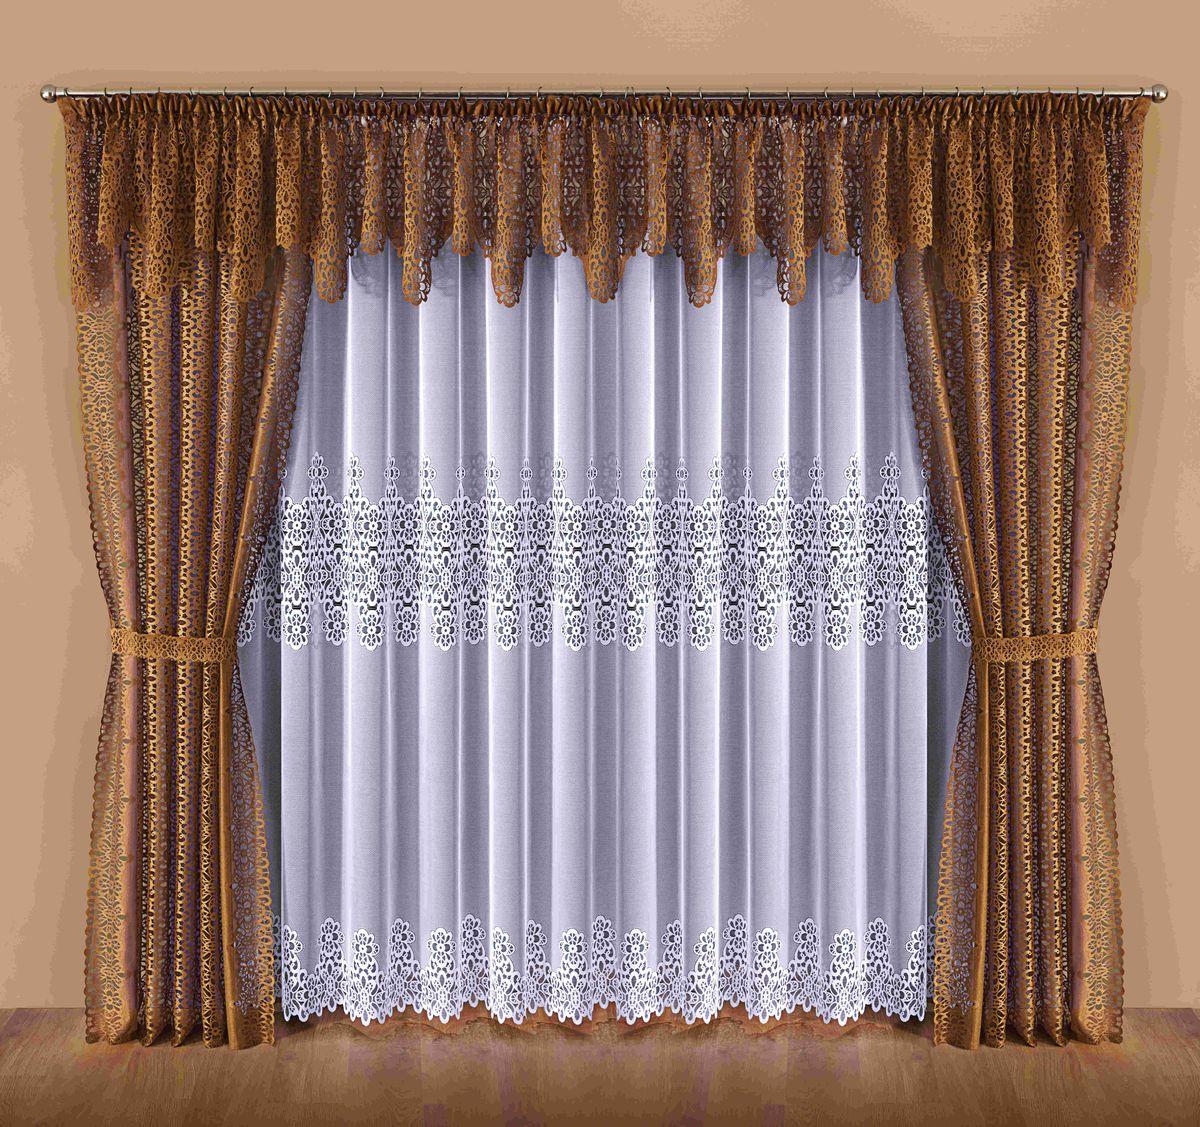 Комплект штор Wisan Dalia, на ленте, цвет: белый, коричневый, высота 250 см комплект штор wisan lara на ленте цвет оранжевый белый высота 250 см